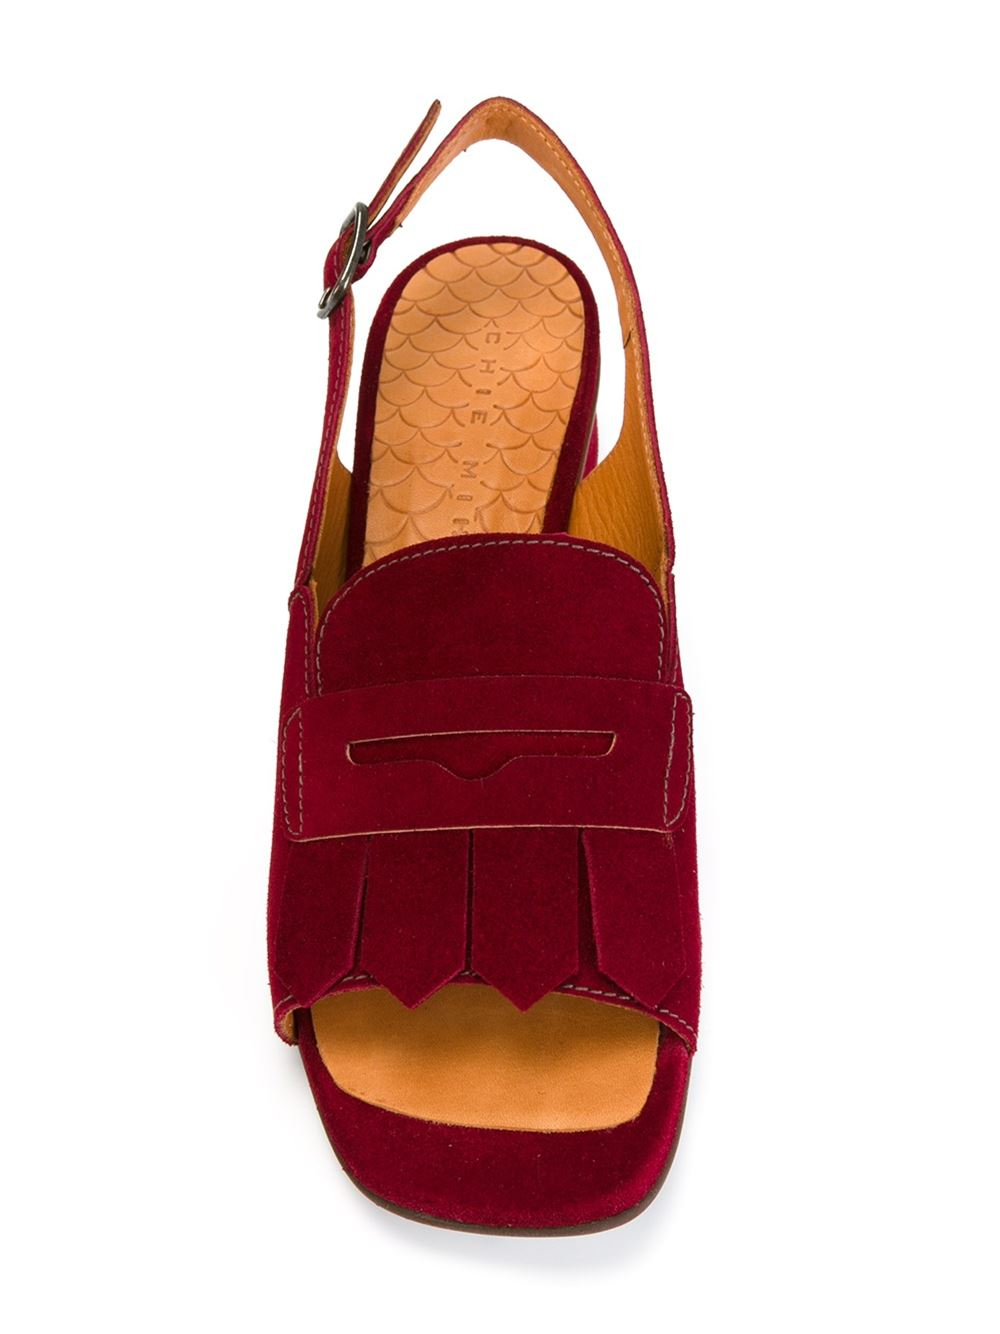 chie mihara front fringe sandals in red lyst. Black Bedroom Furniture Sets. Home Design Ideas